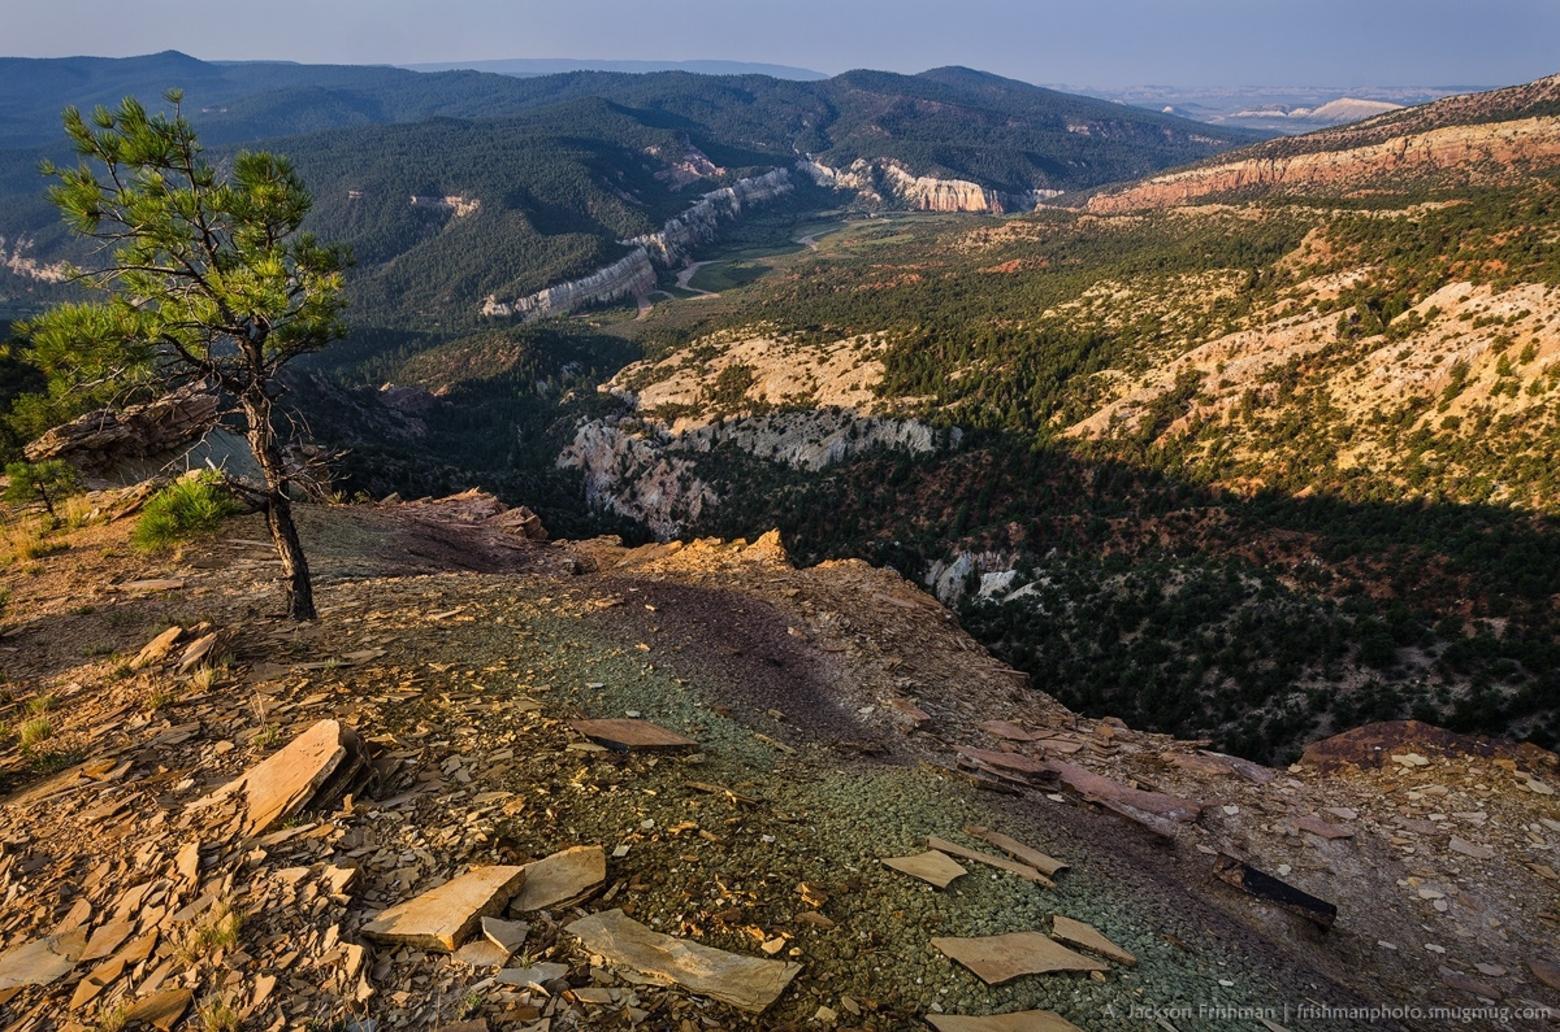 Chaka River Canyon Wilderness, New Mexico. Photo by Jackson Frishman